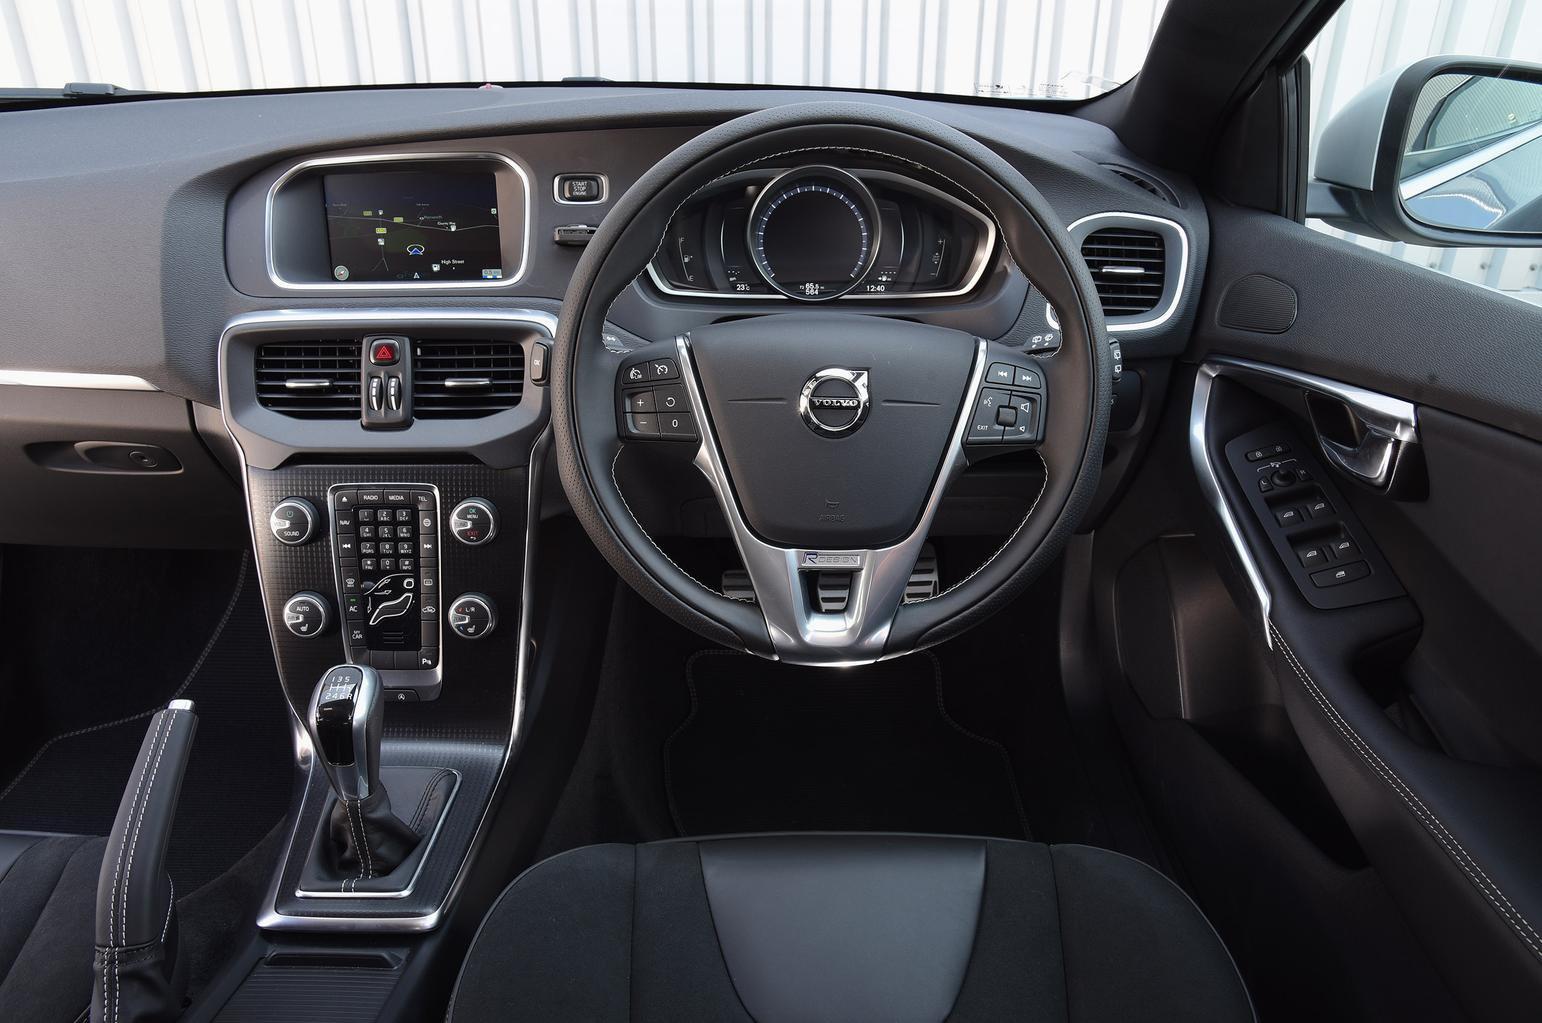 2016 Volvo V40 T3 review